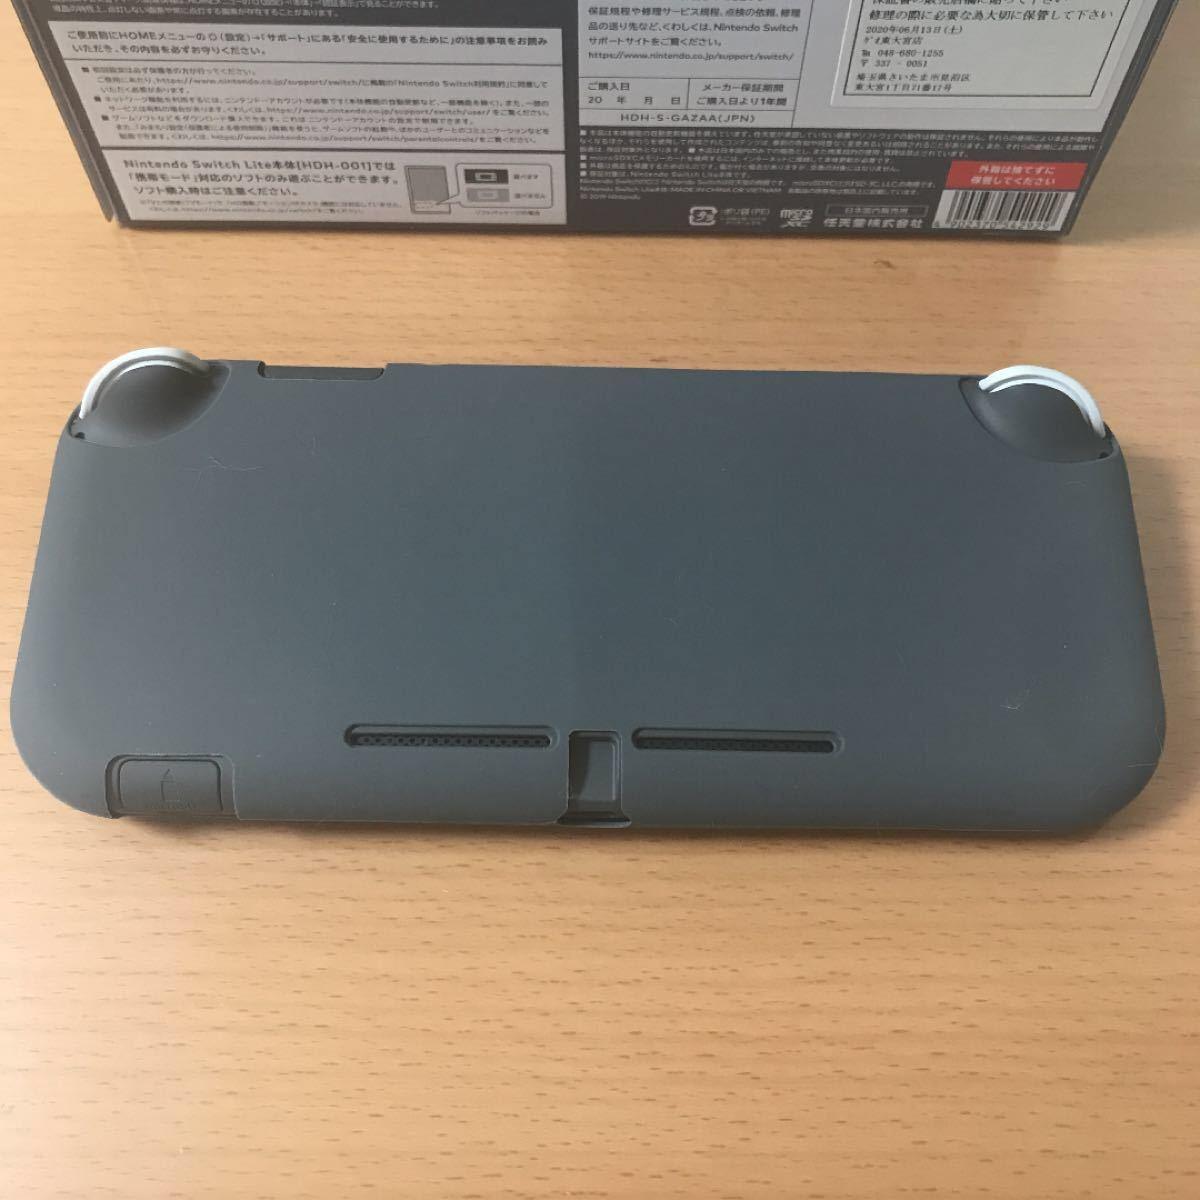 Nintendo Switch NINTENDO SWITCH LITE クレー スイッチ 保証あり